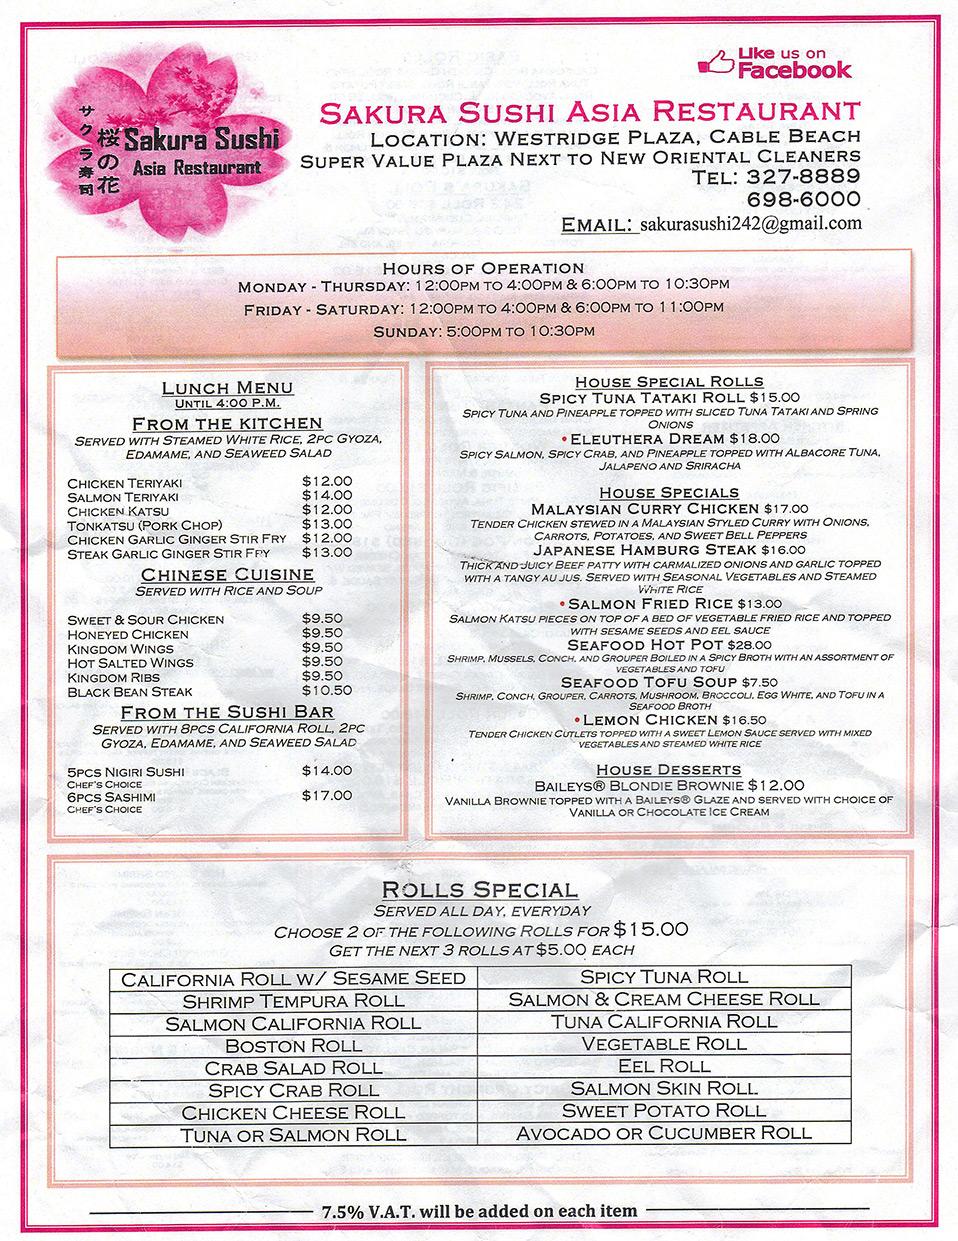 Sakura sushi asia restaurant nassau nassau paradise for Asia asian cuisine menu